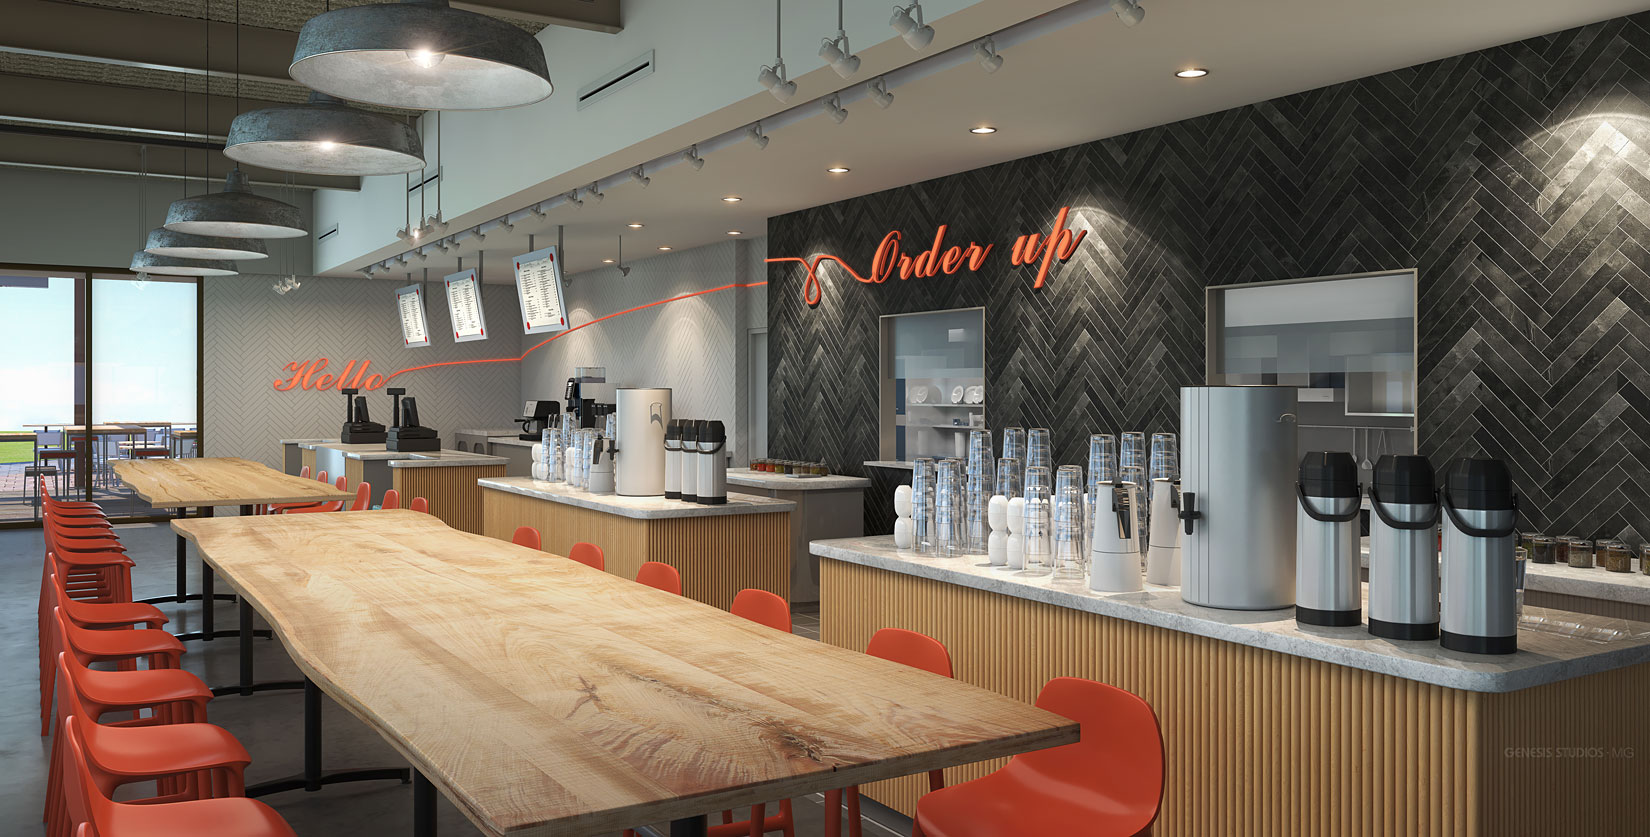 717174 Digital Photorealistic Architectural Renderings of Bonapitit Coffee Bar for Shea Design